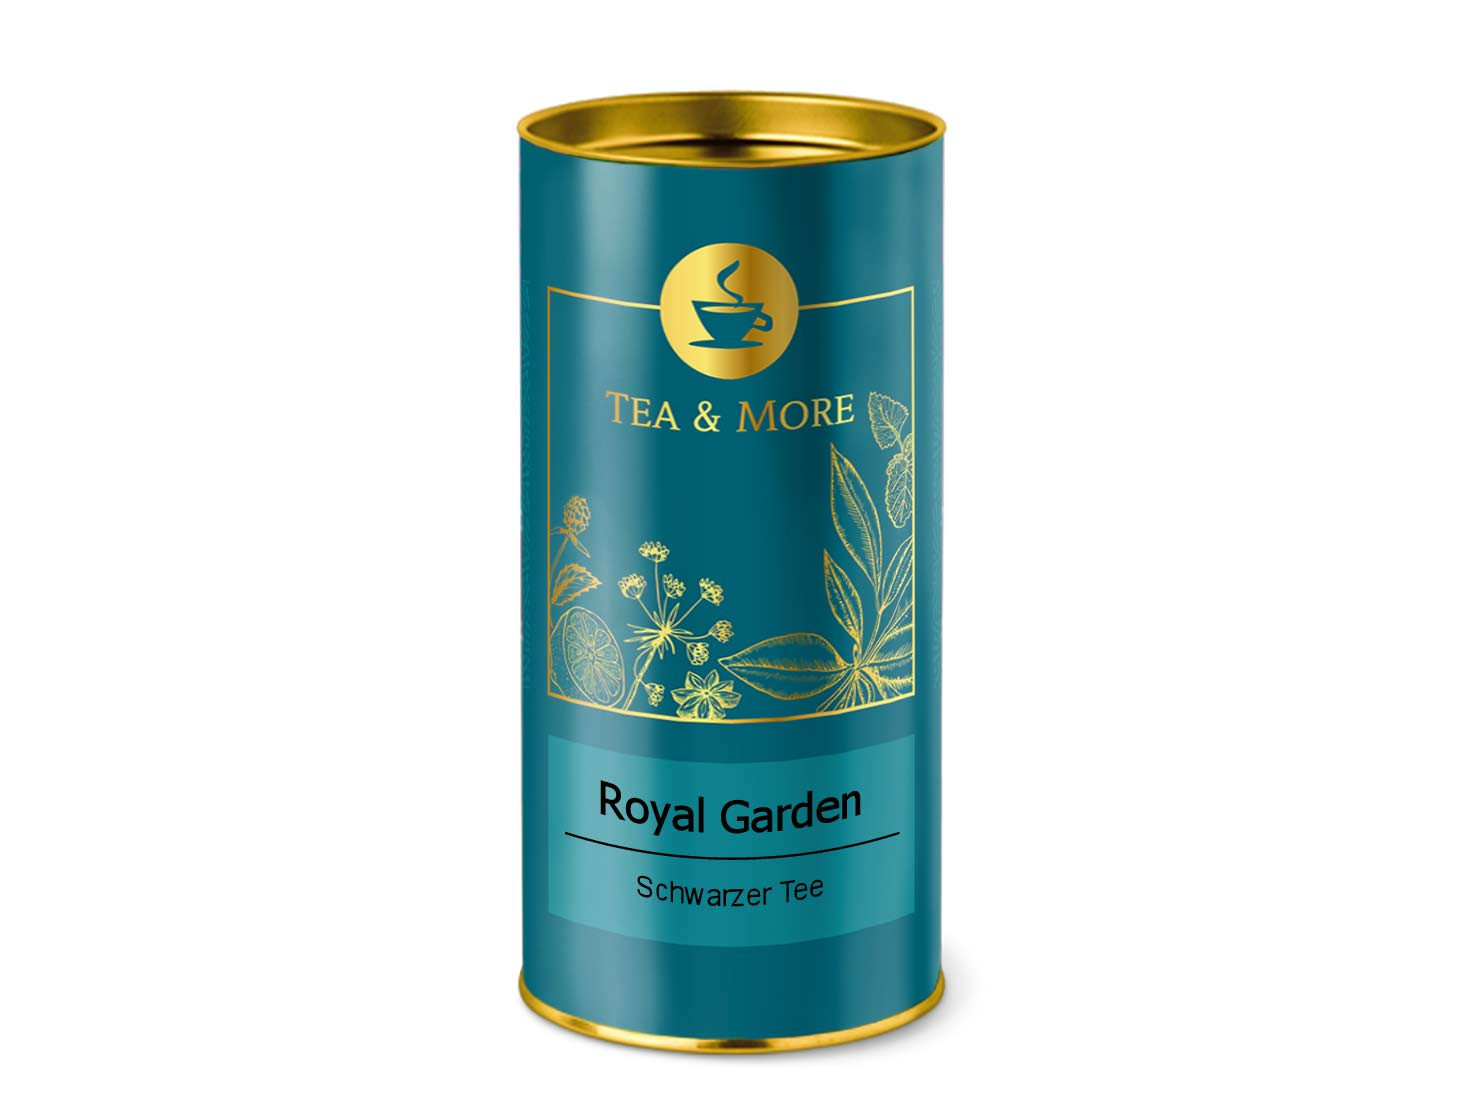 Darjeeling Royal Garden First Flush